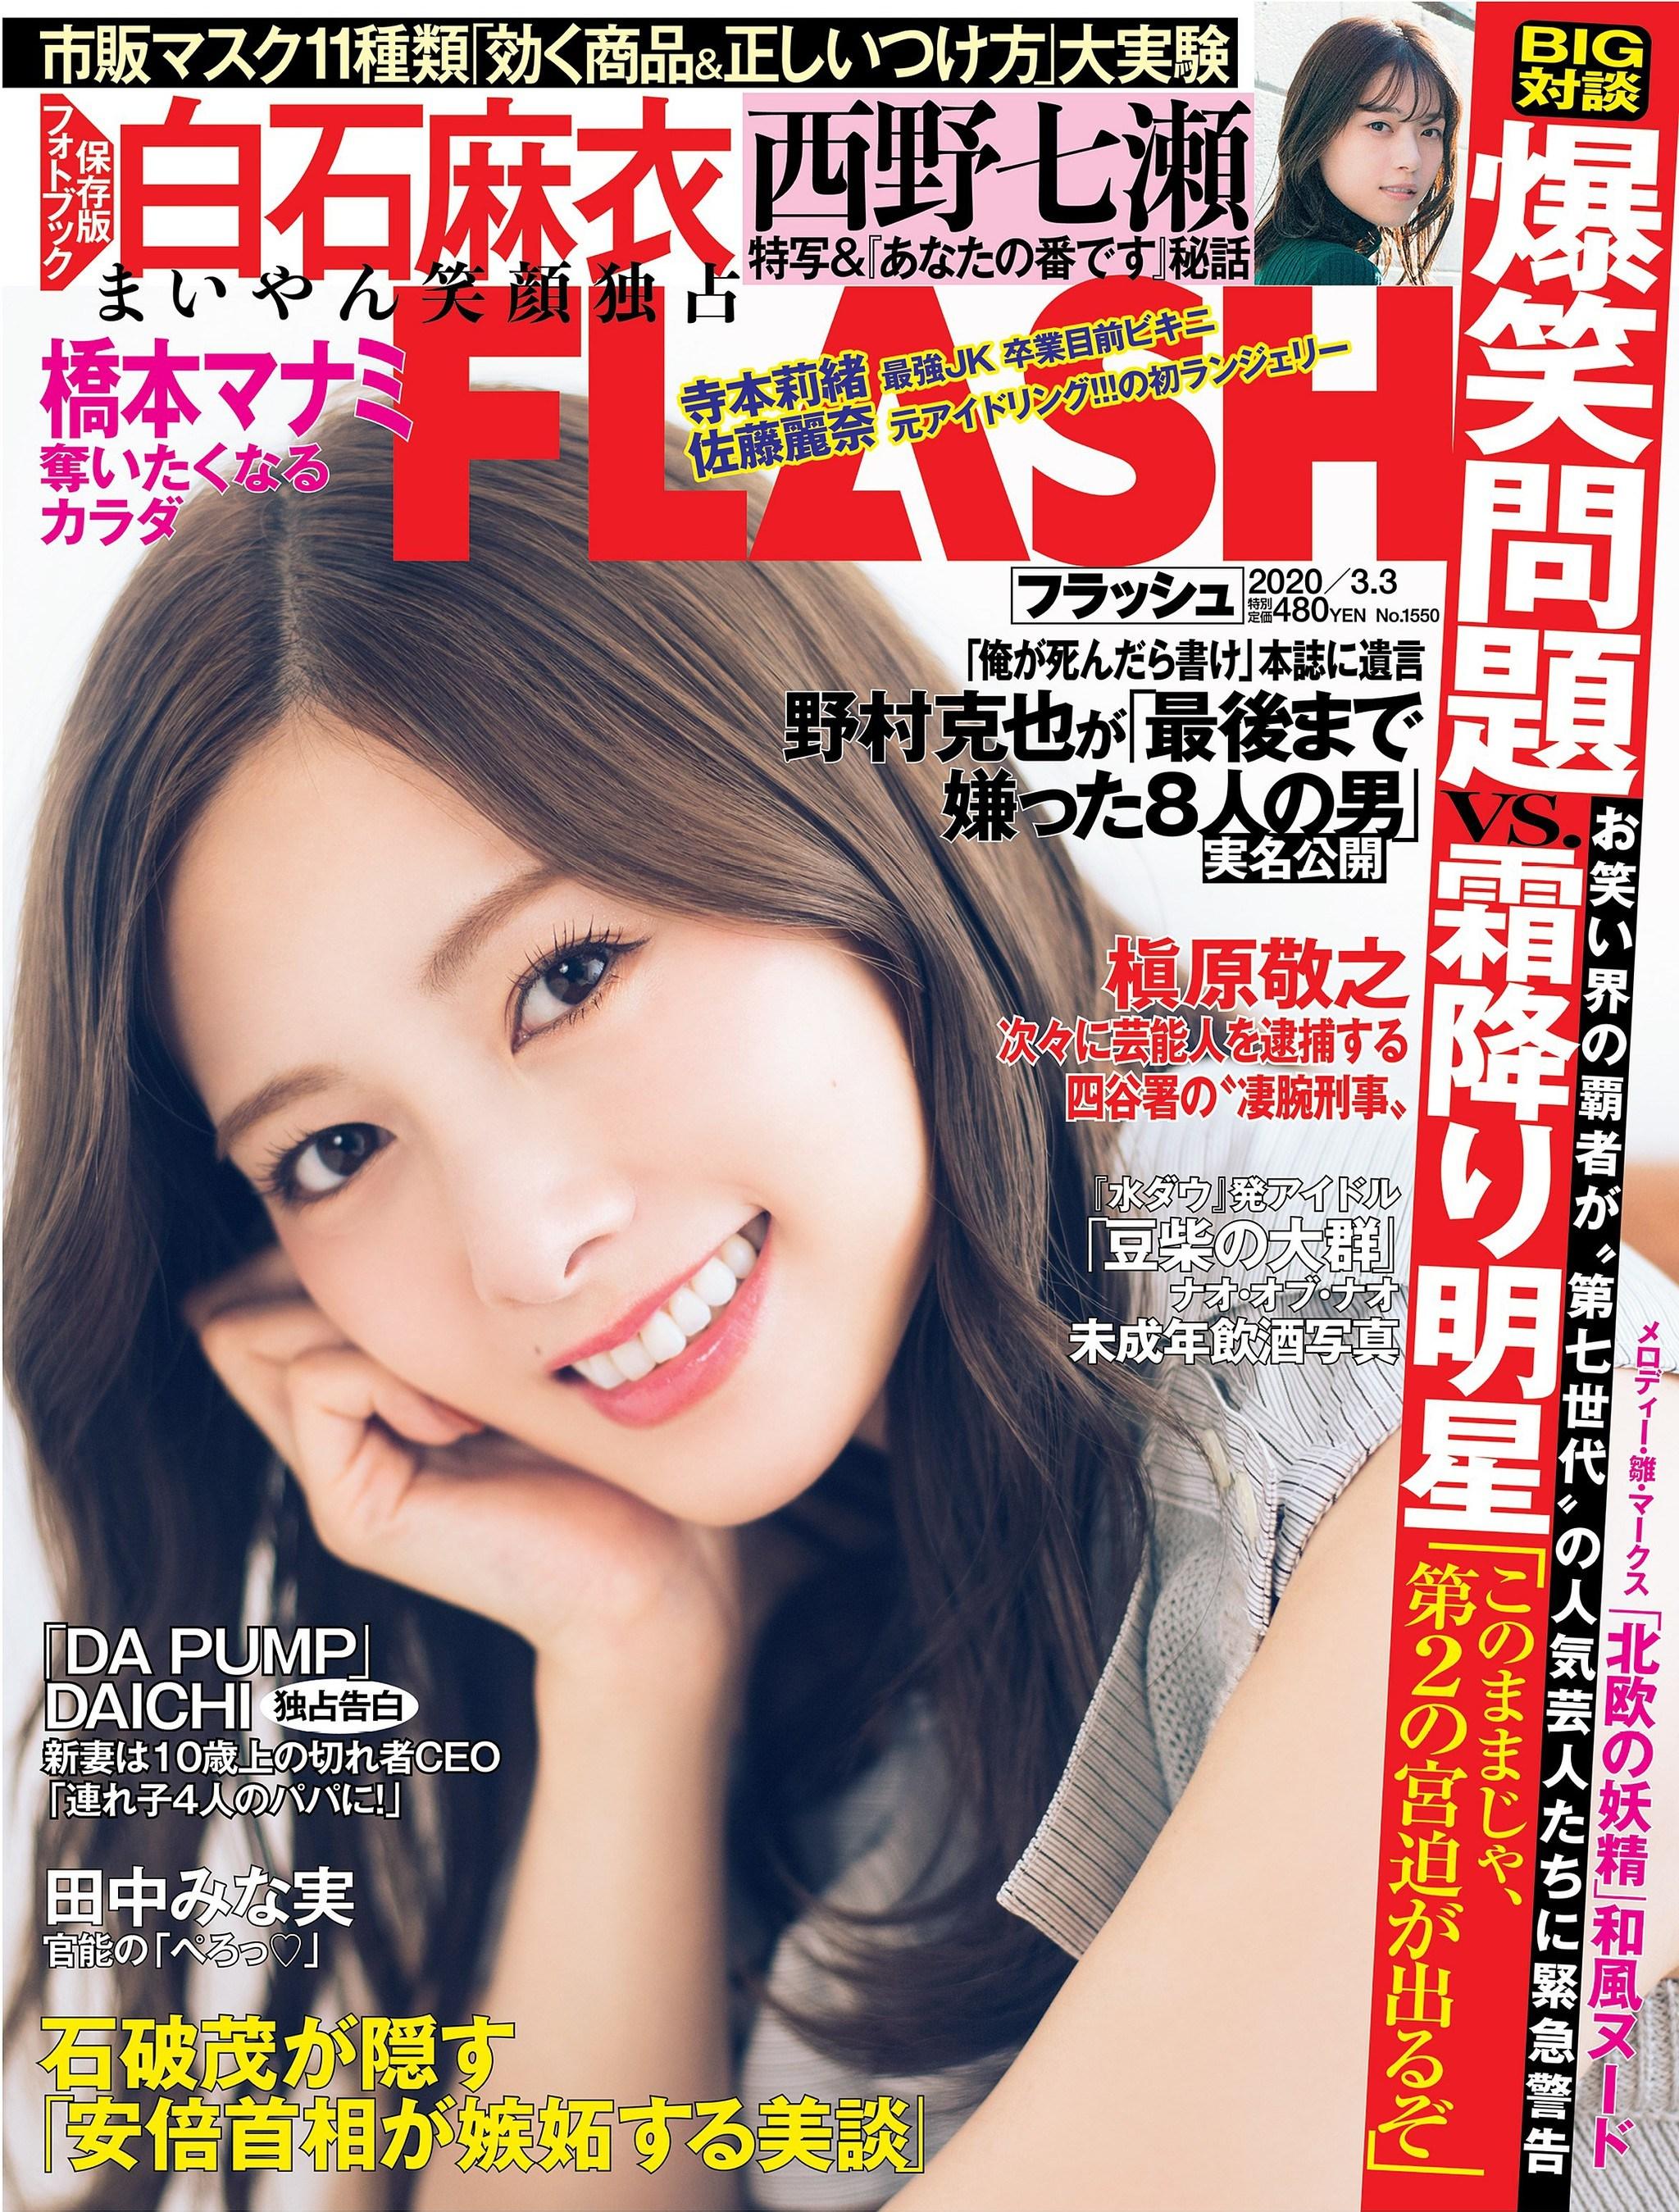 FLASH 2020年03月03号 乃木坂46 白石麻衣